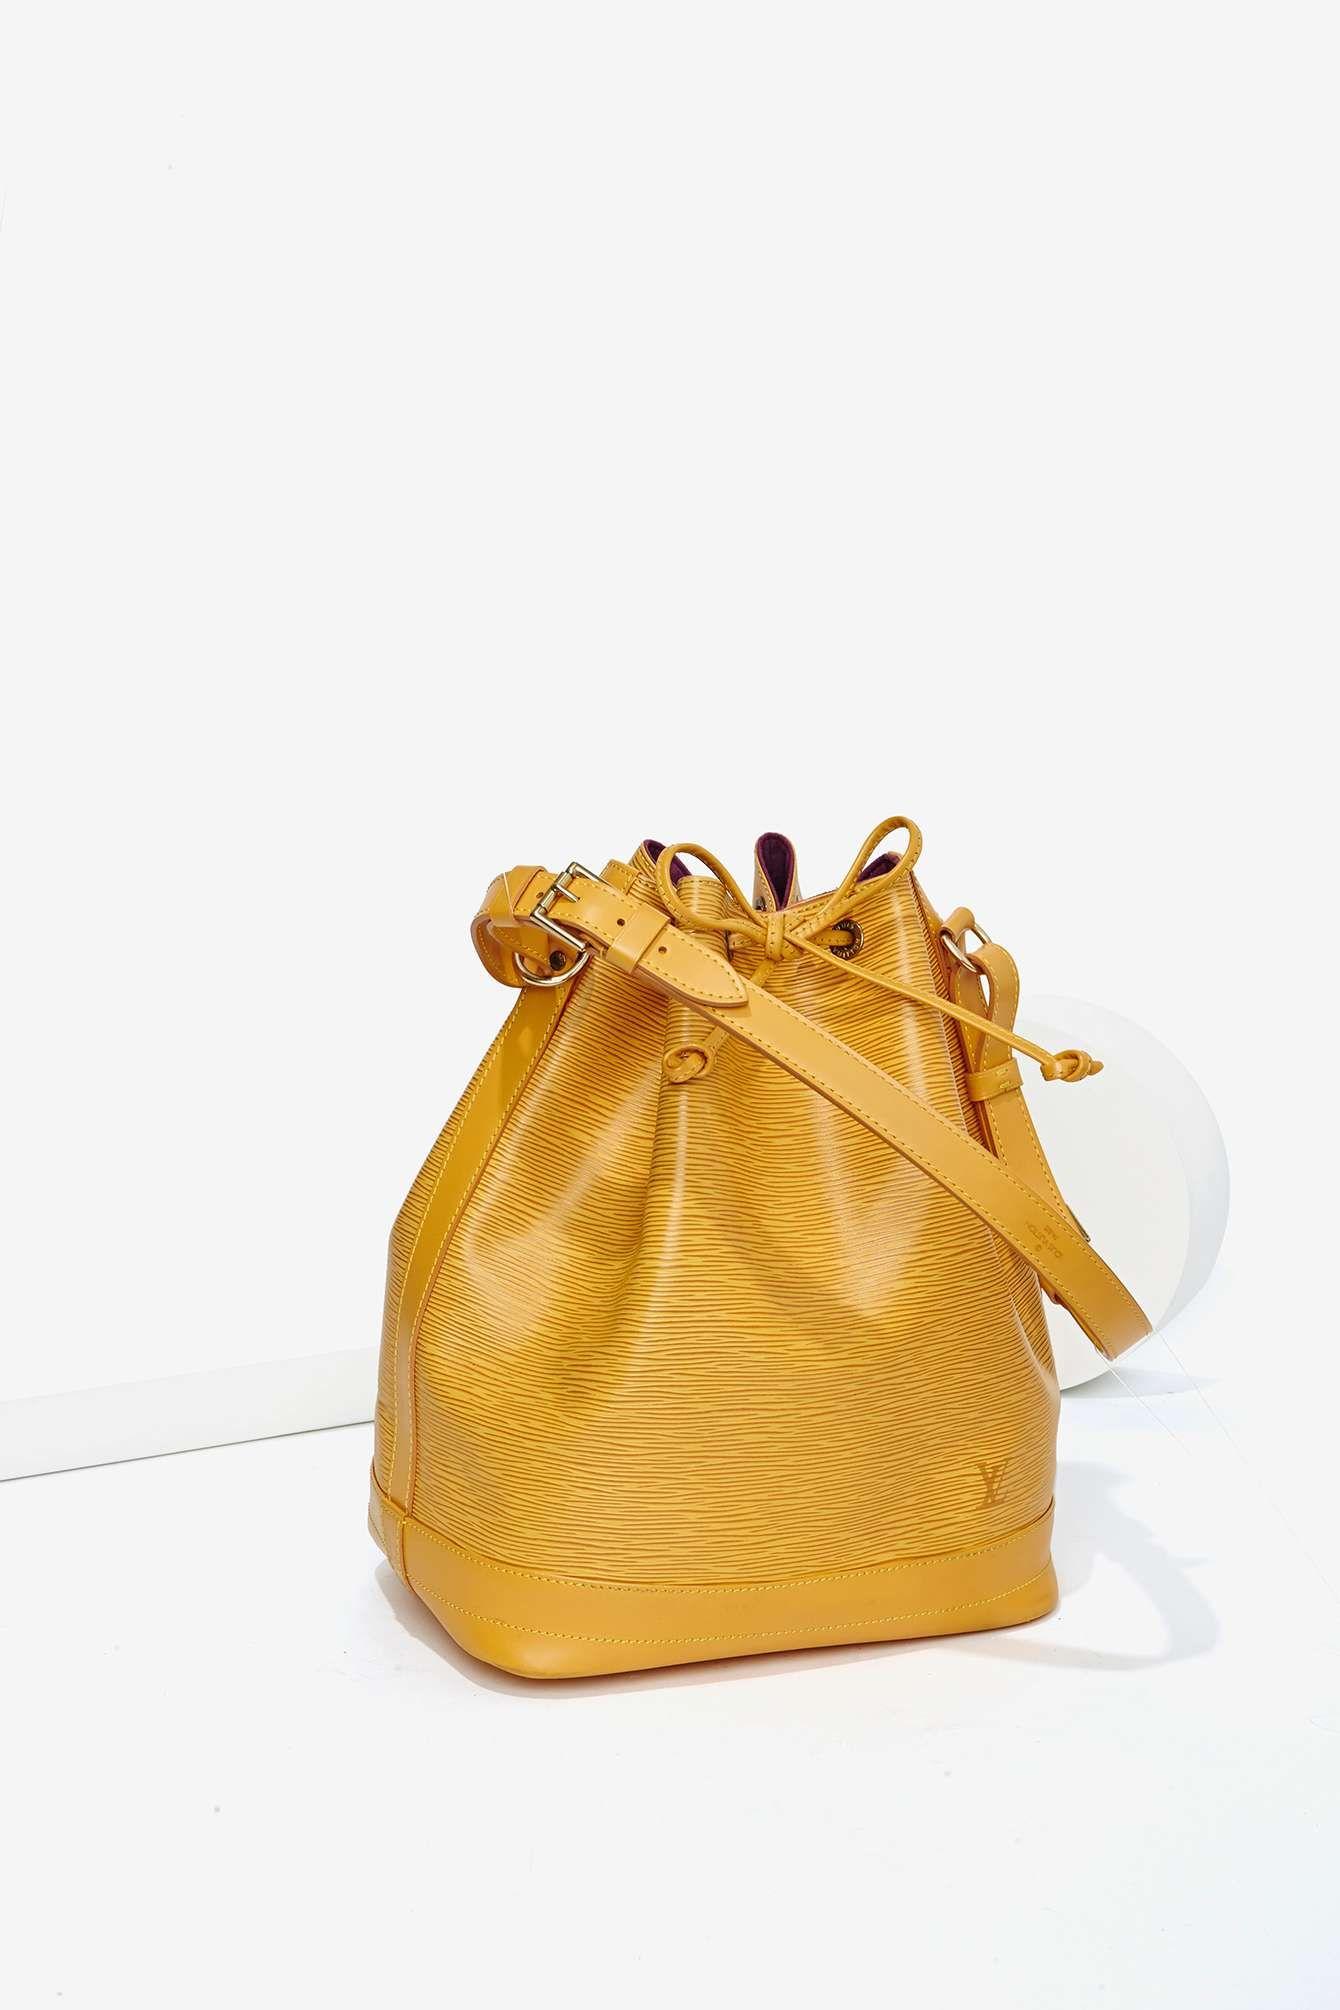 be55a7e80fc5 Vintage Louis Vuitton Epi Leather Petit Noe Bag - Yellow